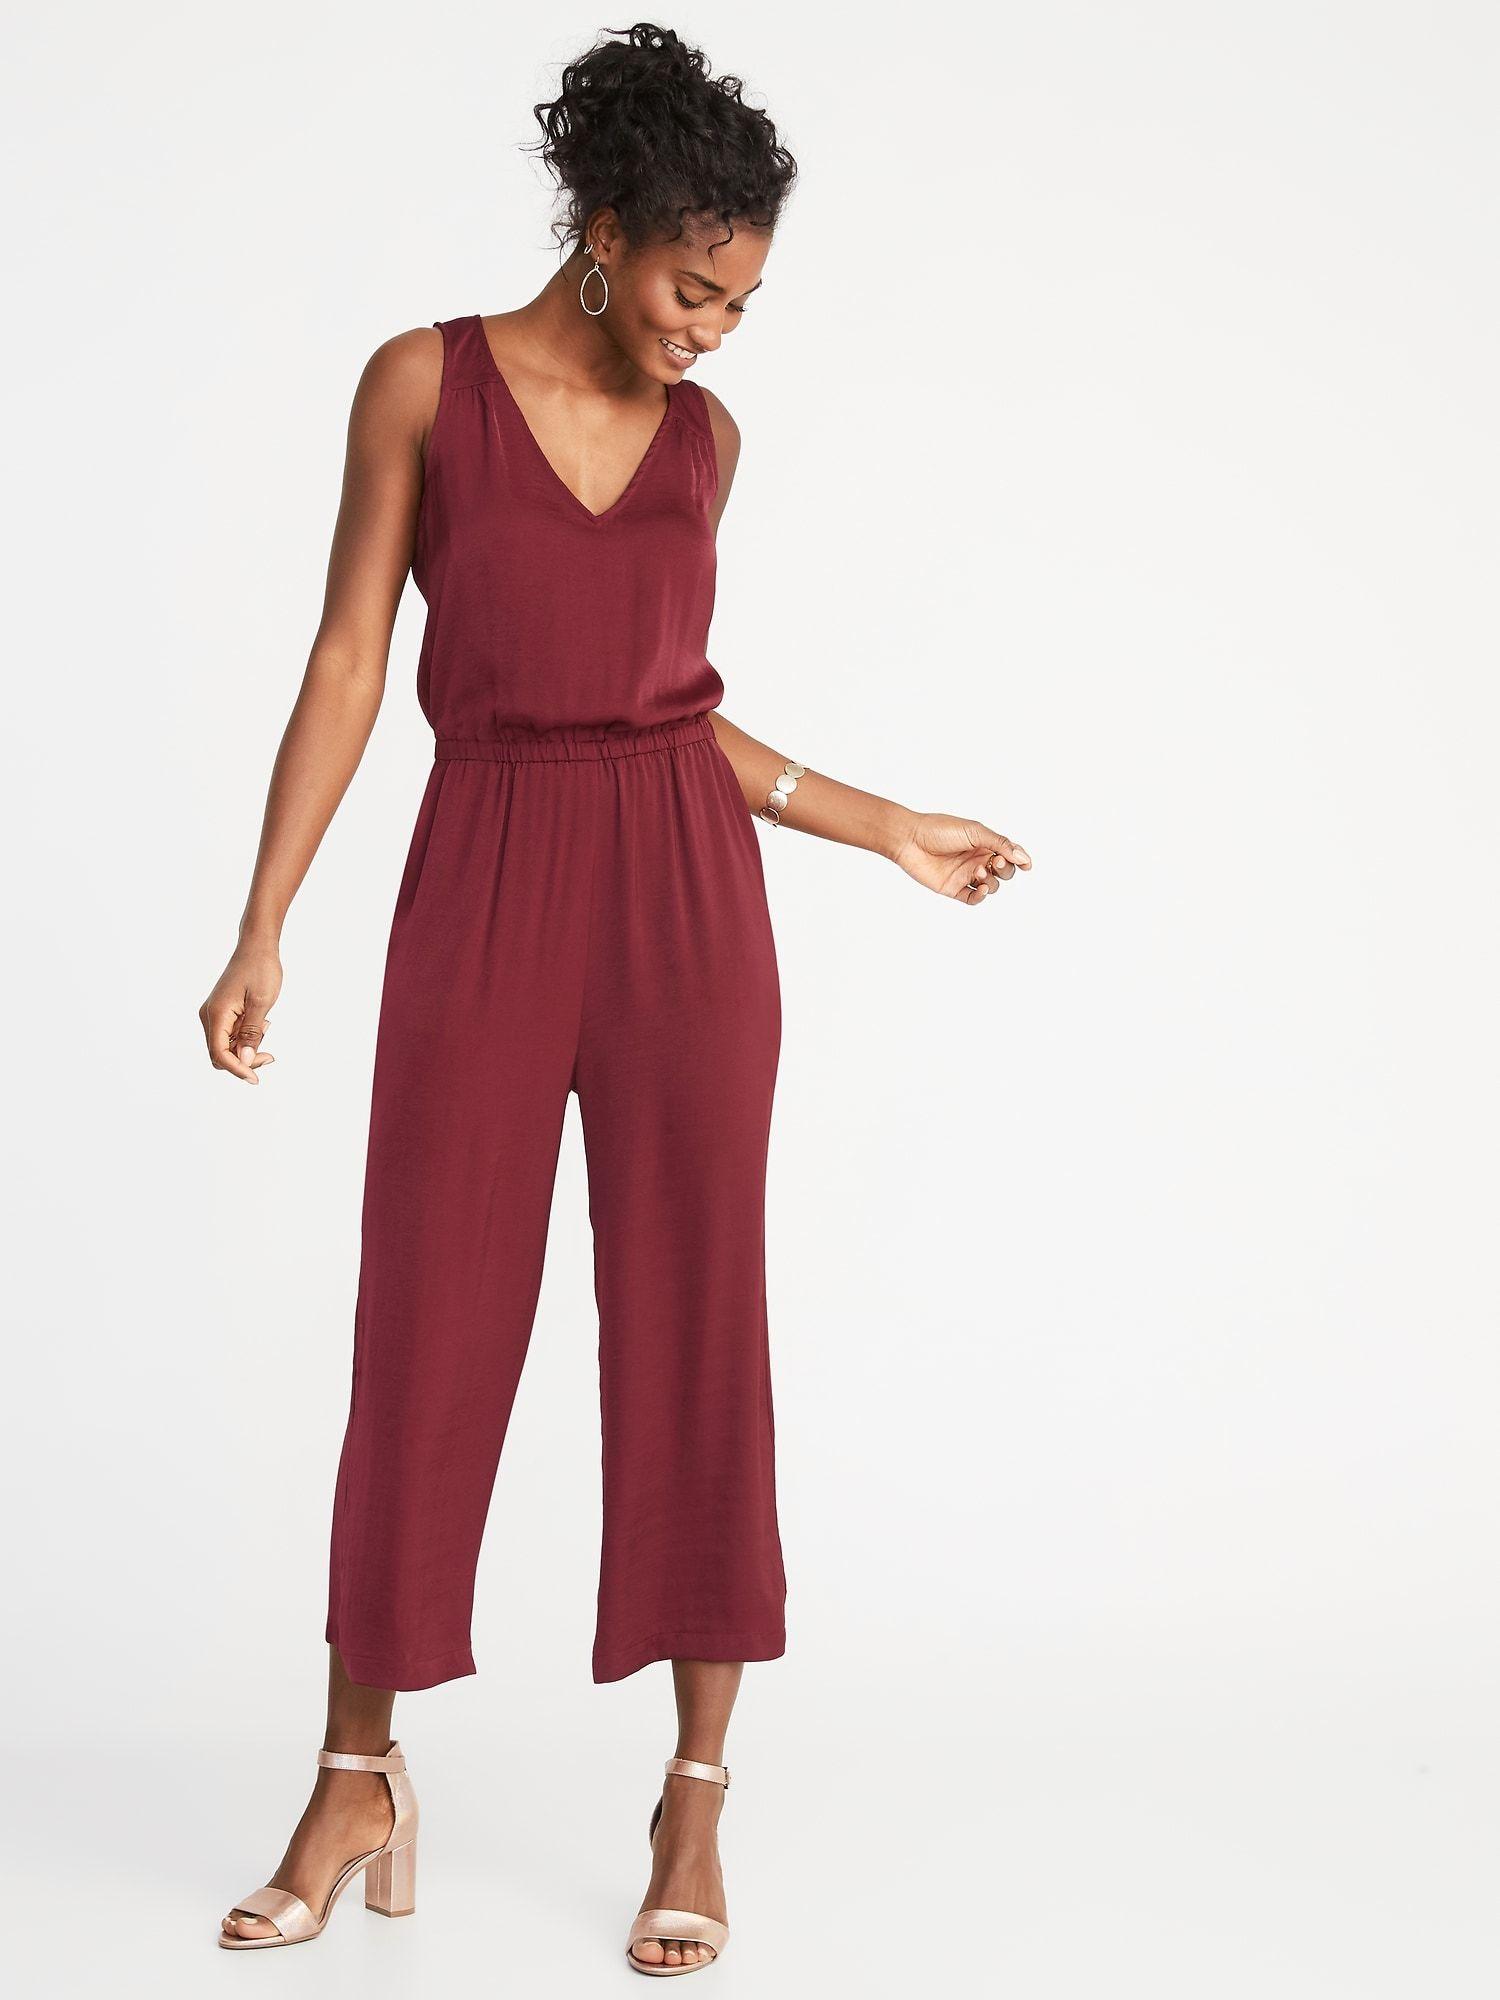 dc7e4ed844 Maroon Waist-Defined Sleeveless Wide-Leg Jumpsuit for Women | Old Navy - XS